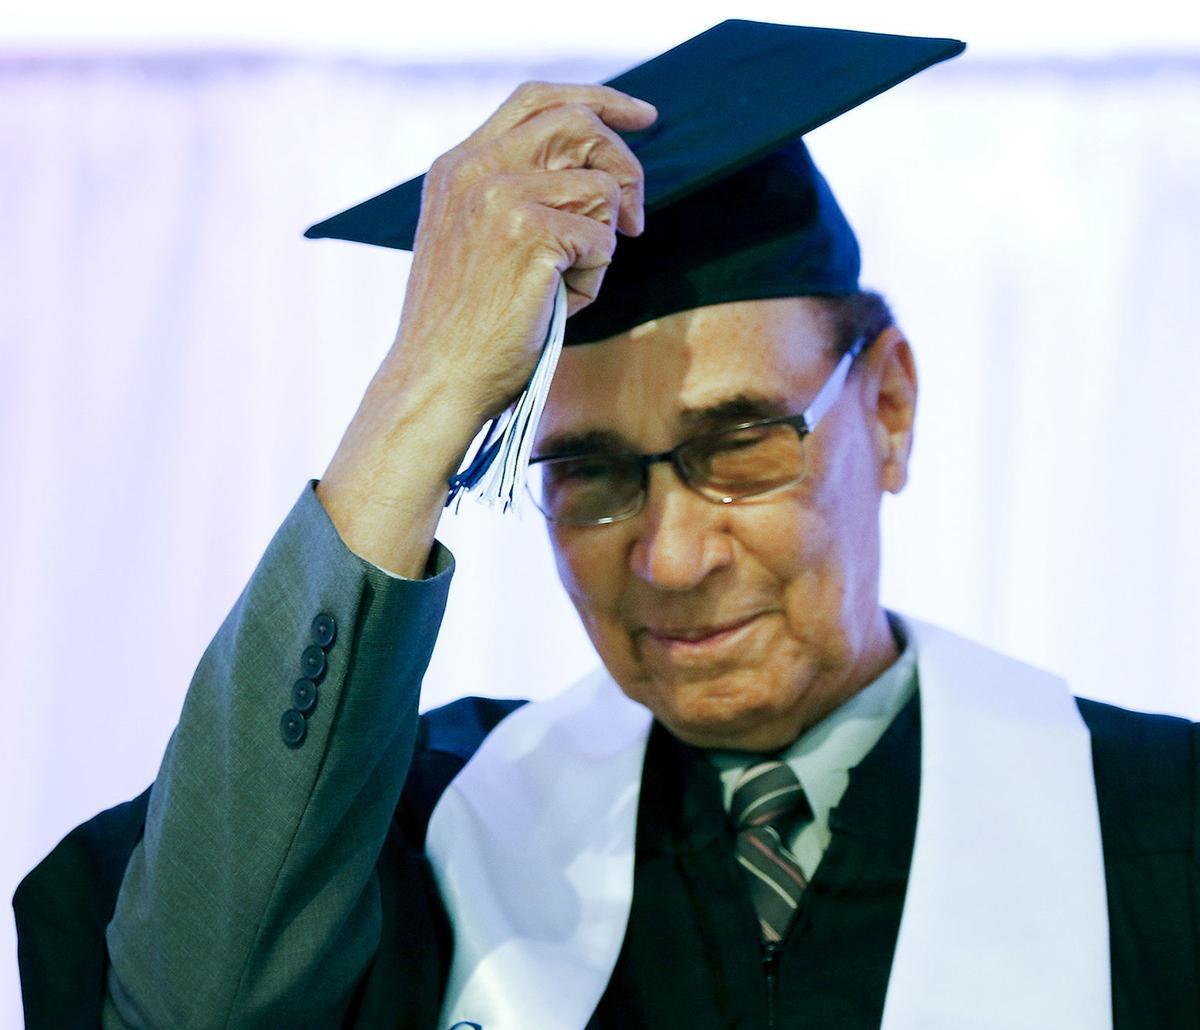 030719 Veteran's diplomas 02.jpg